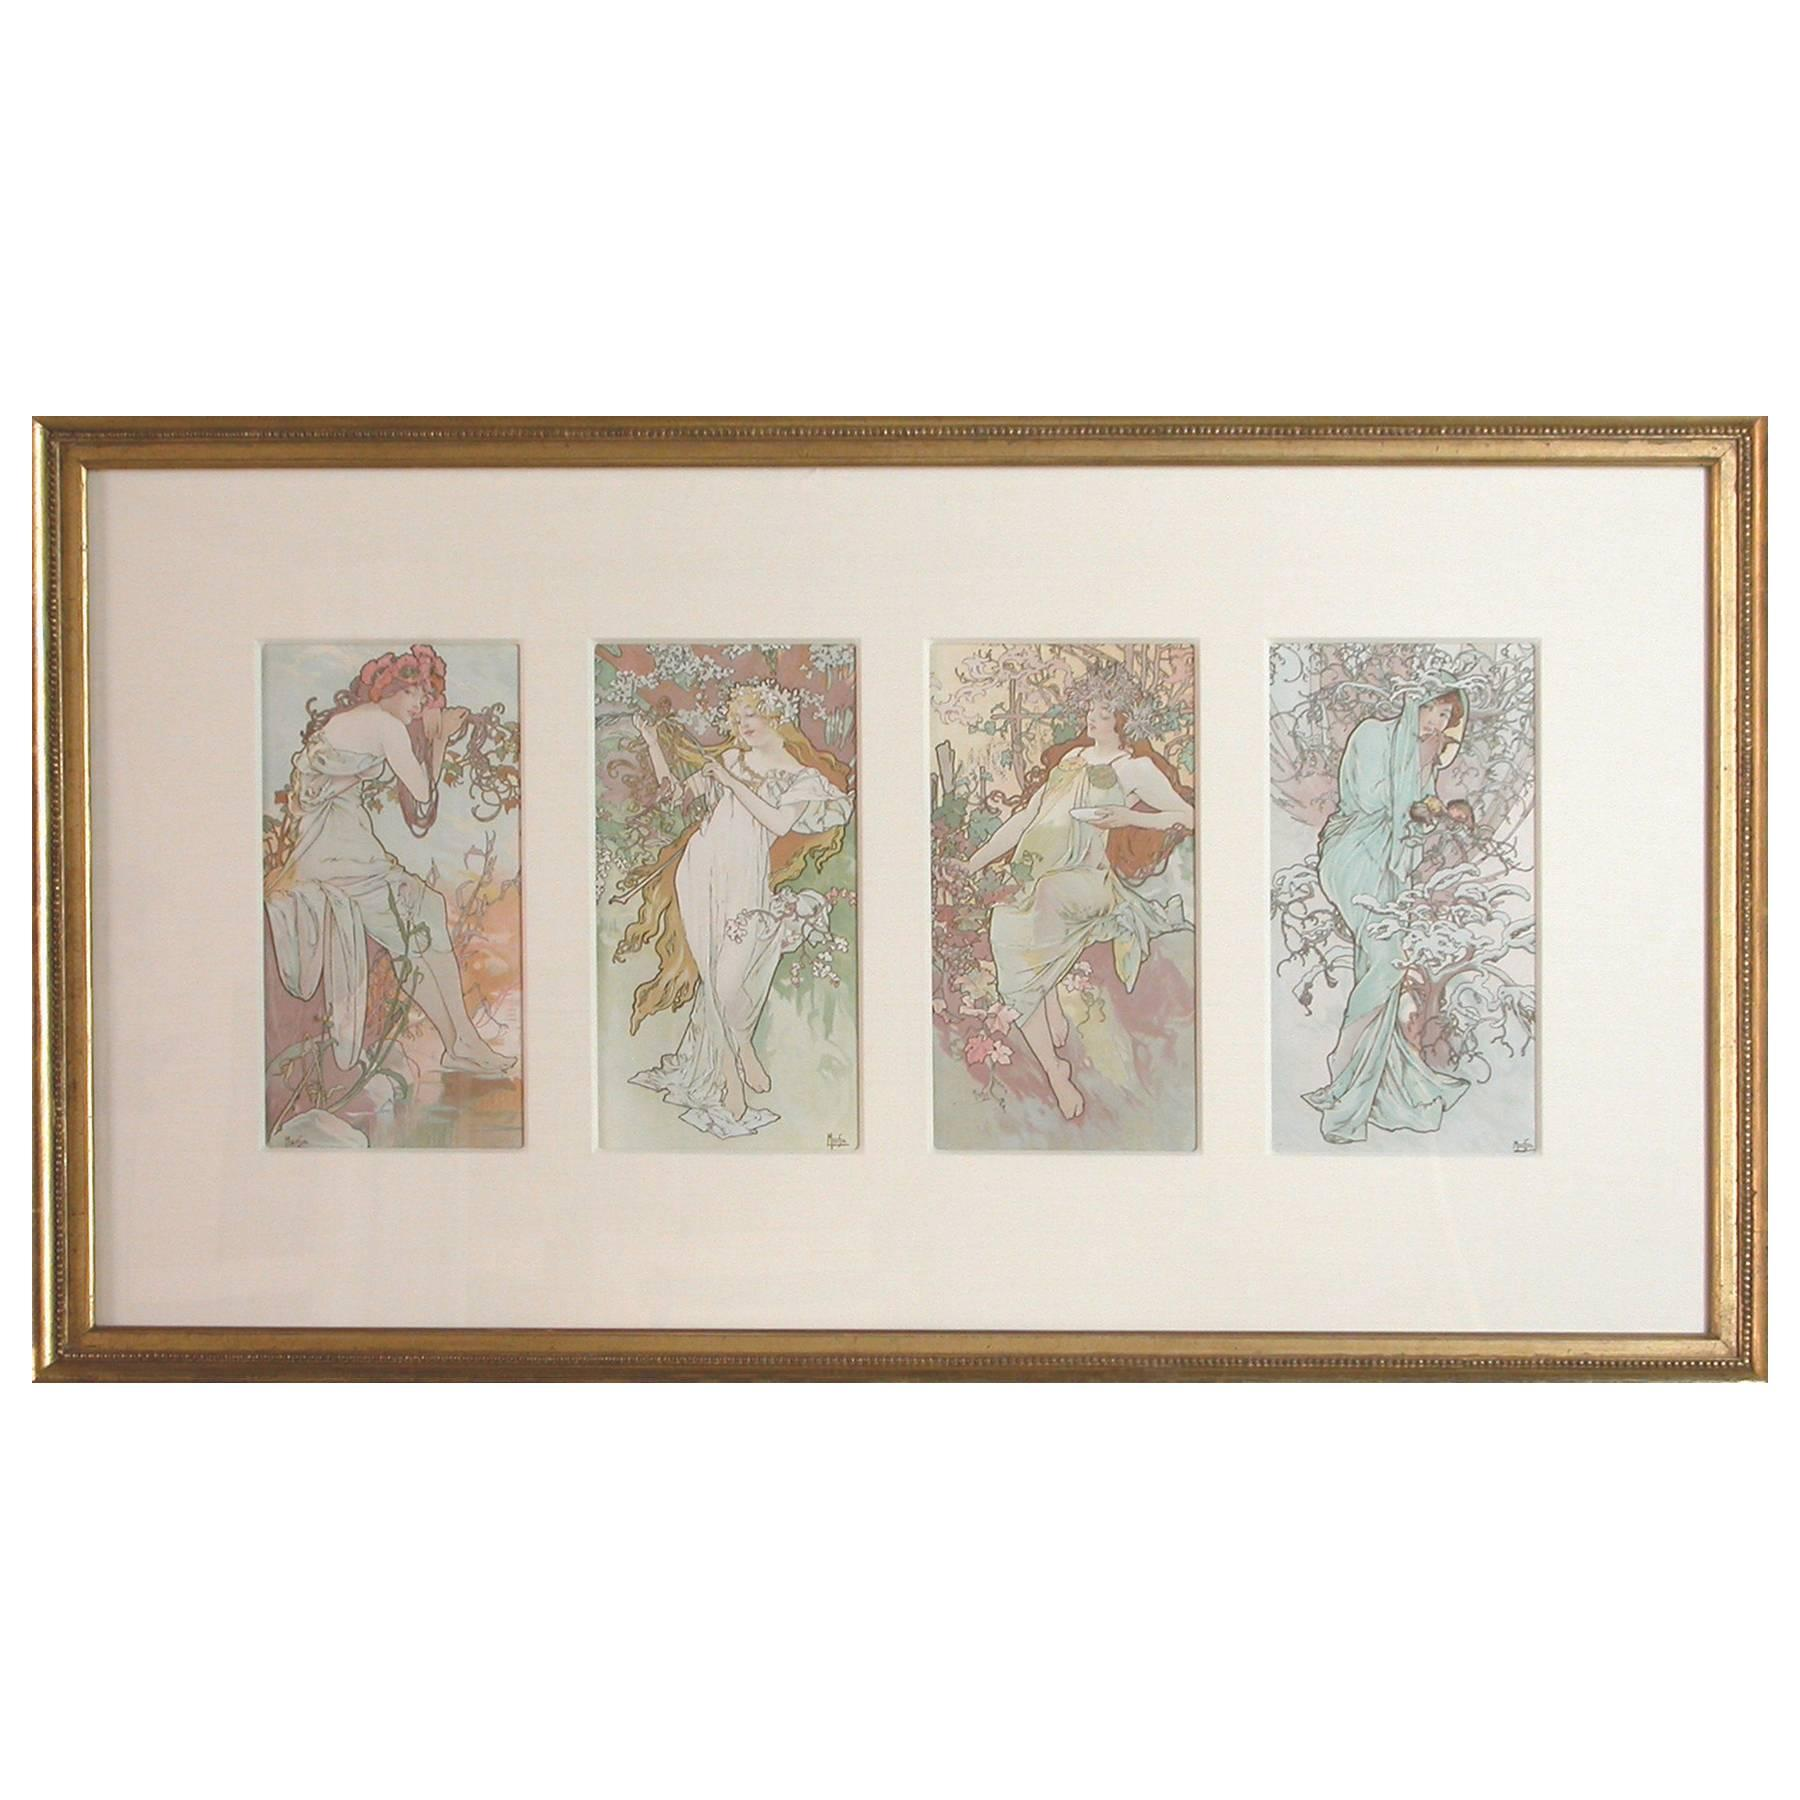 "Original Art Nouveau Lithograph ""the Seasons"" by Alphonse Mucha, 1896"